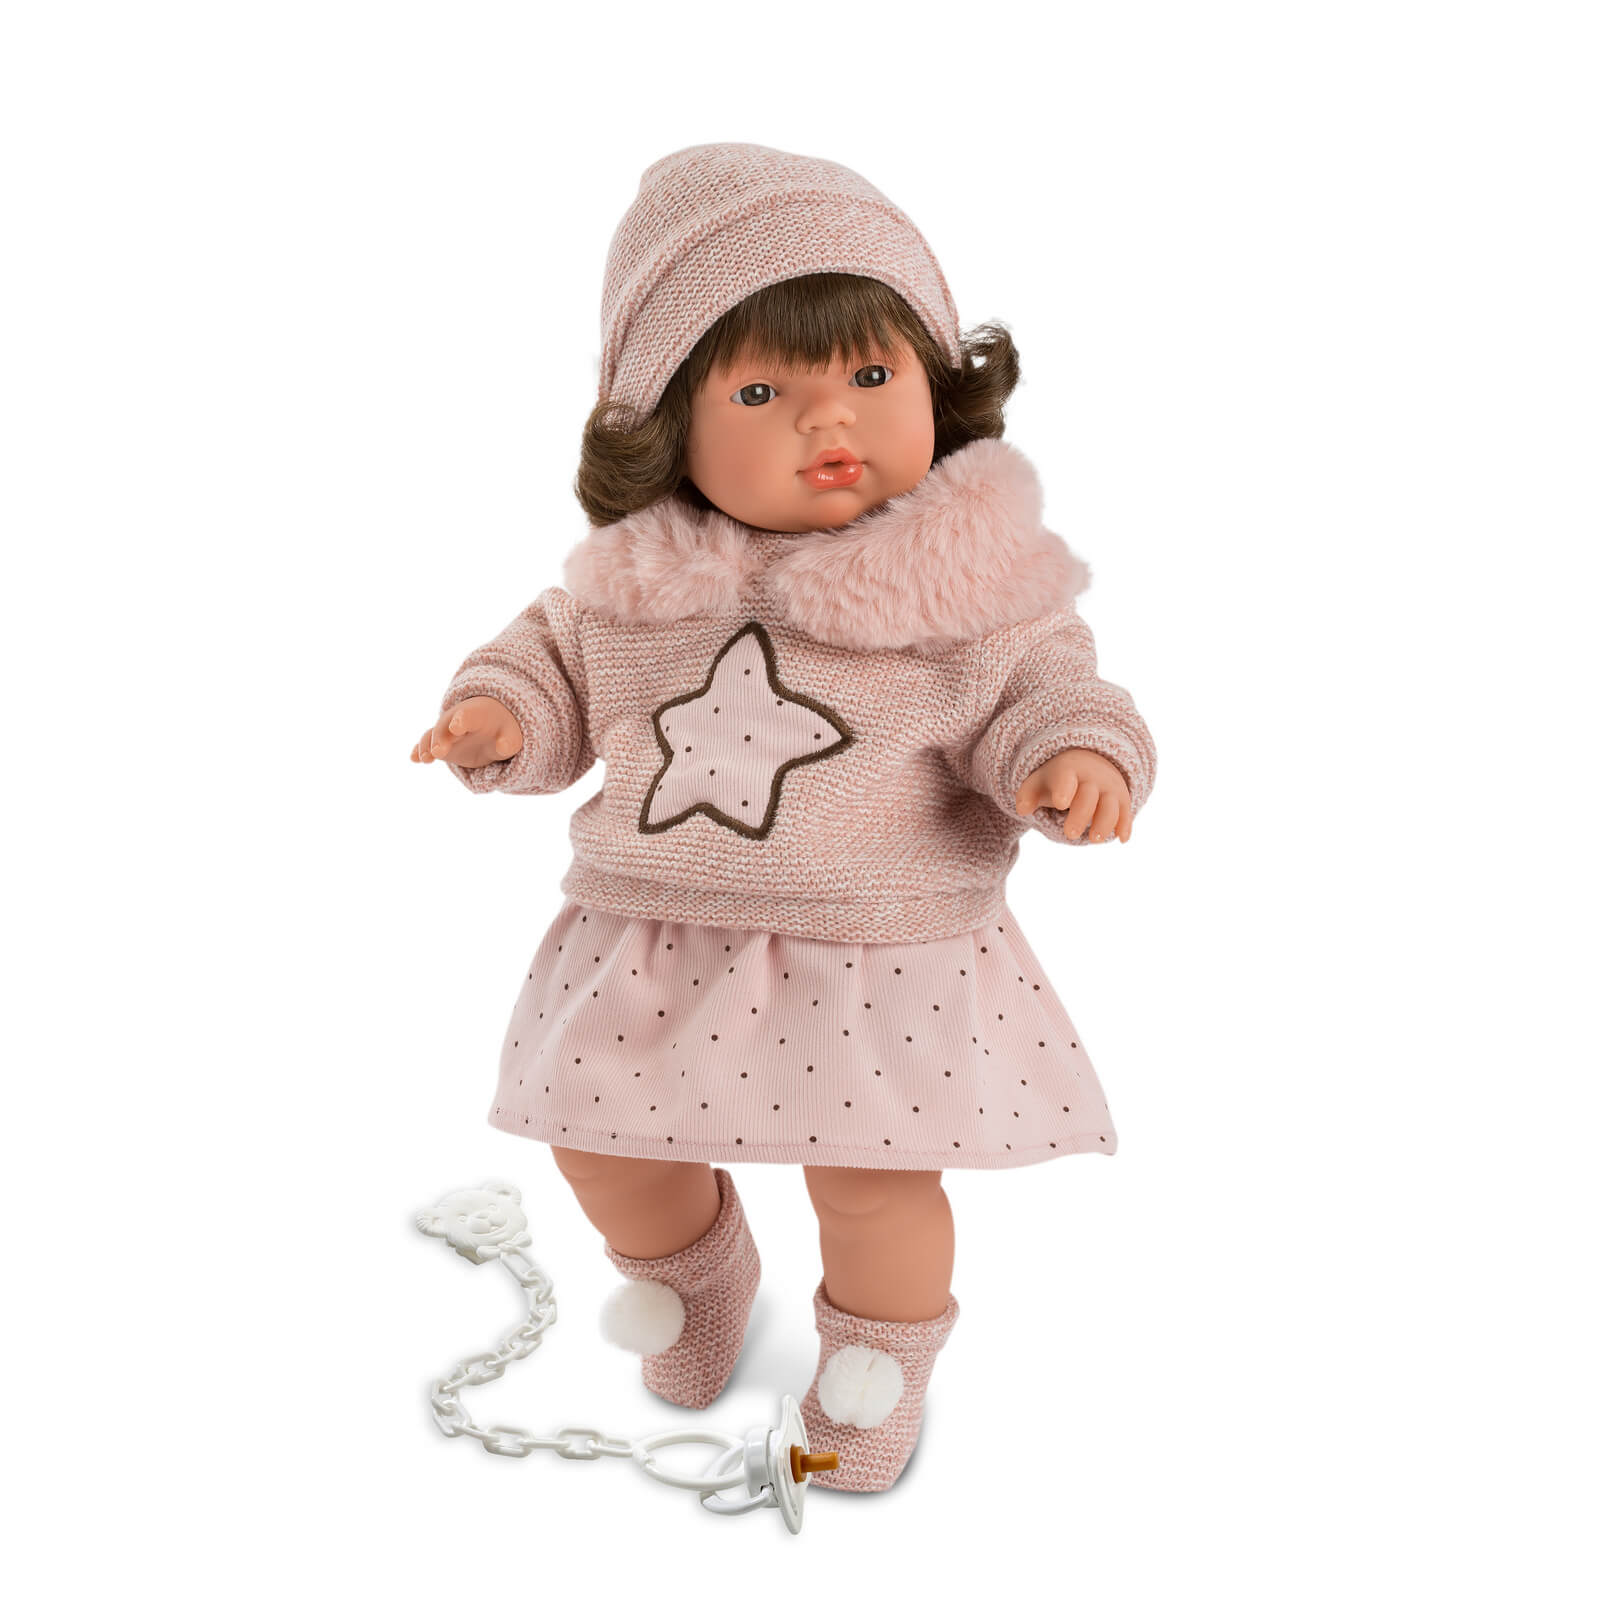 aea9d451573 Llorens Crying Baby Doll Lola - Jadrem Toys